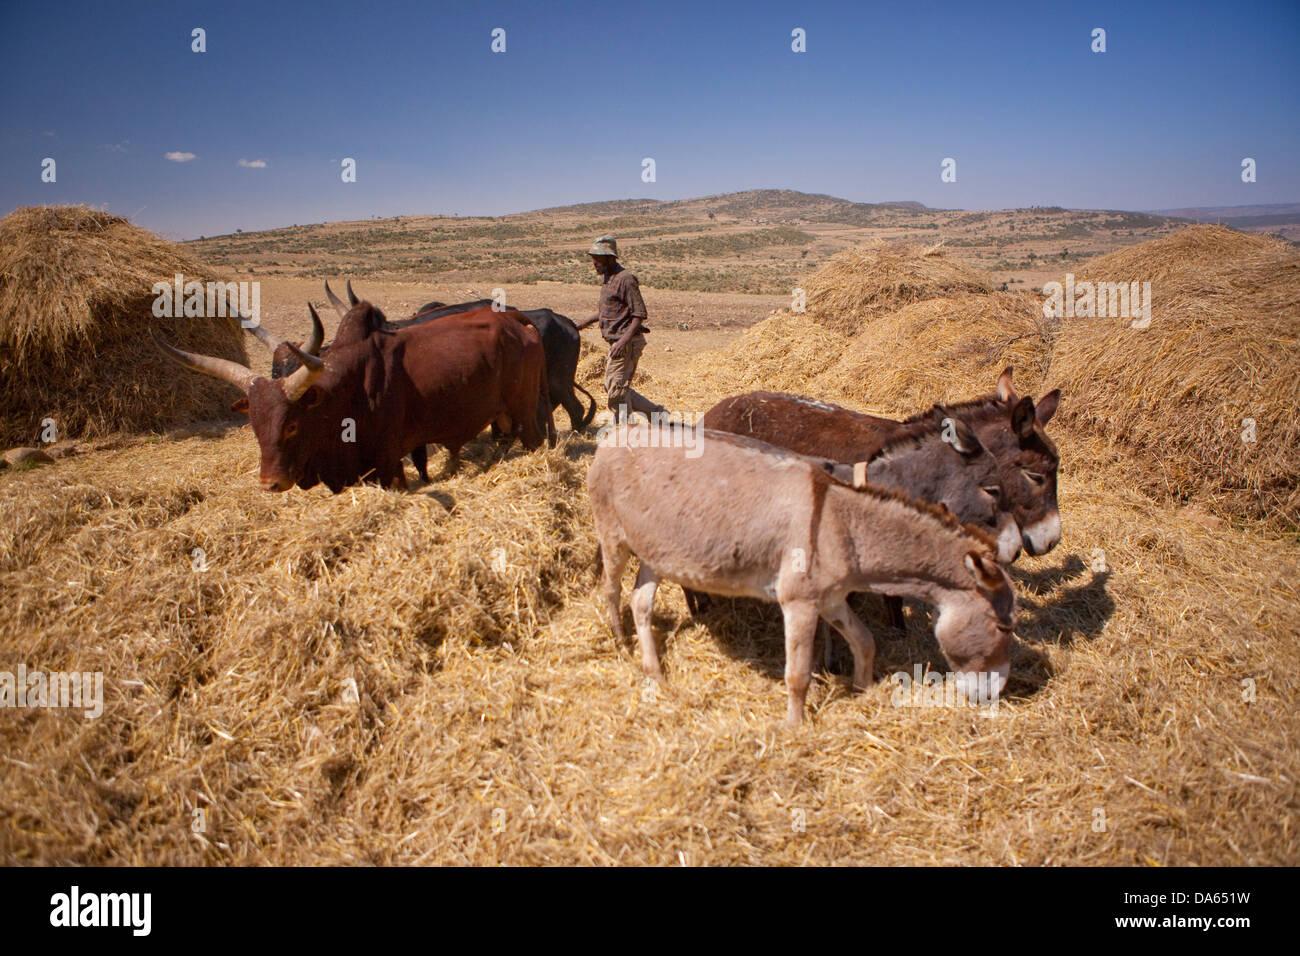 Grain harvest, harvest, crop, Abyssinia highlands, highland, Africa, scenery, landscape, agriculture, Ethiopia, - Stock Image